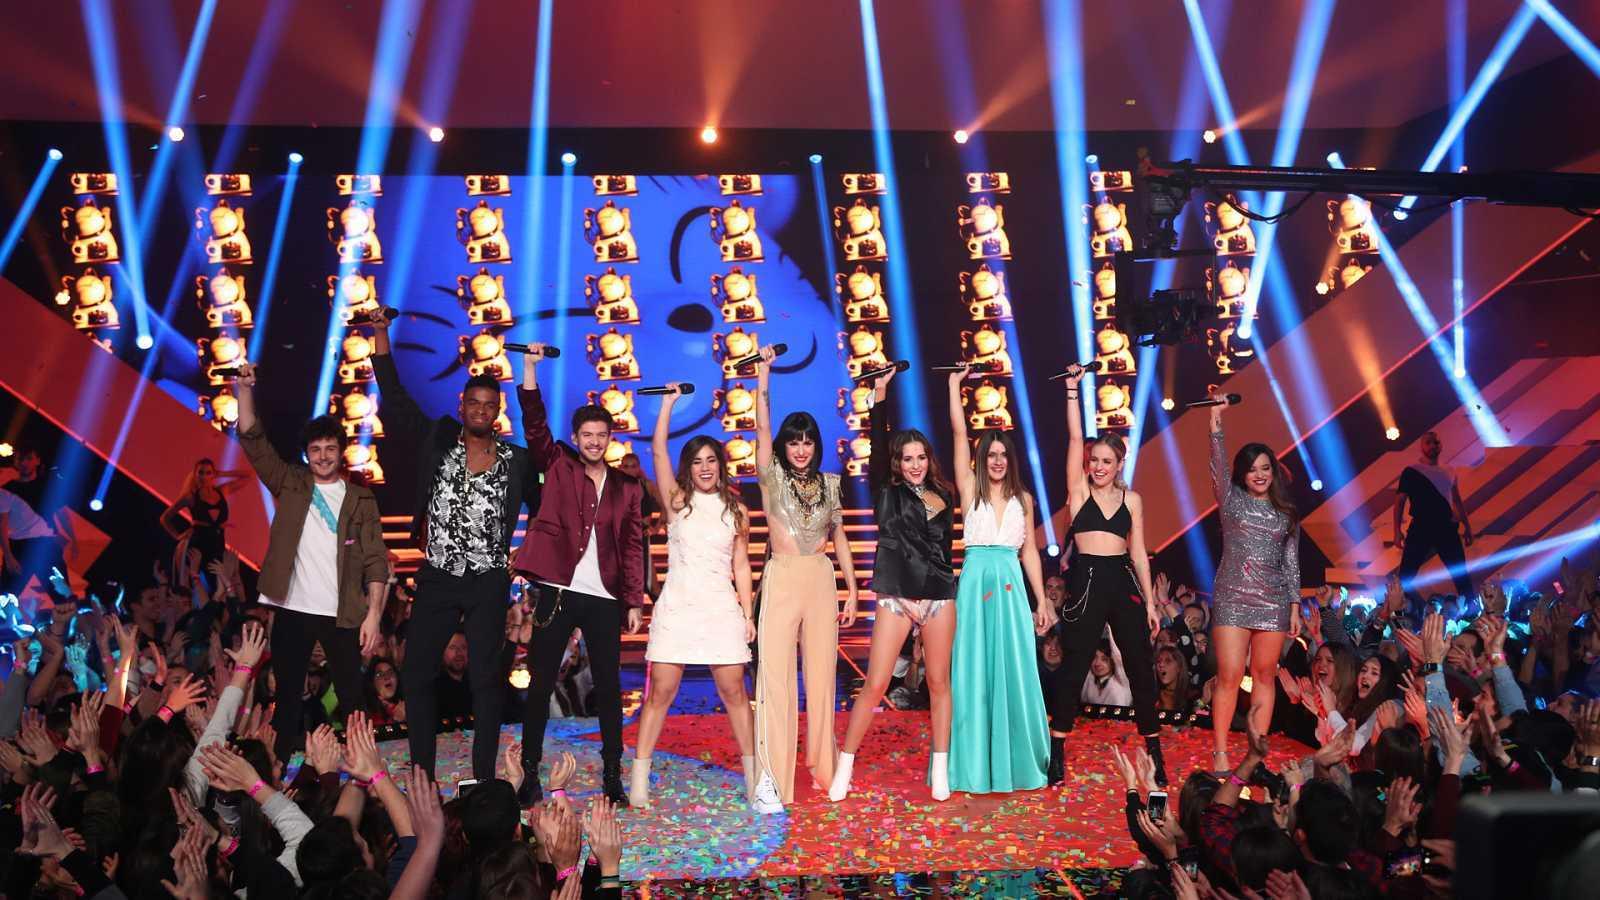 Resultado de imagen de ot gala eurovision 2019